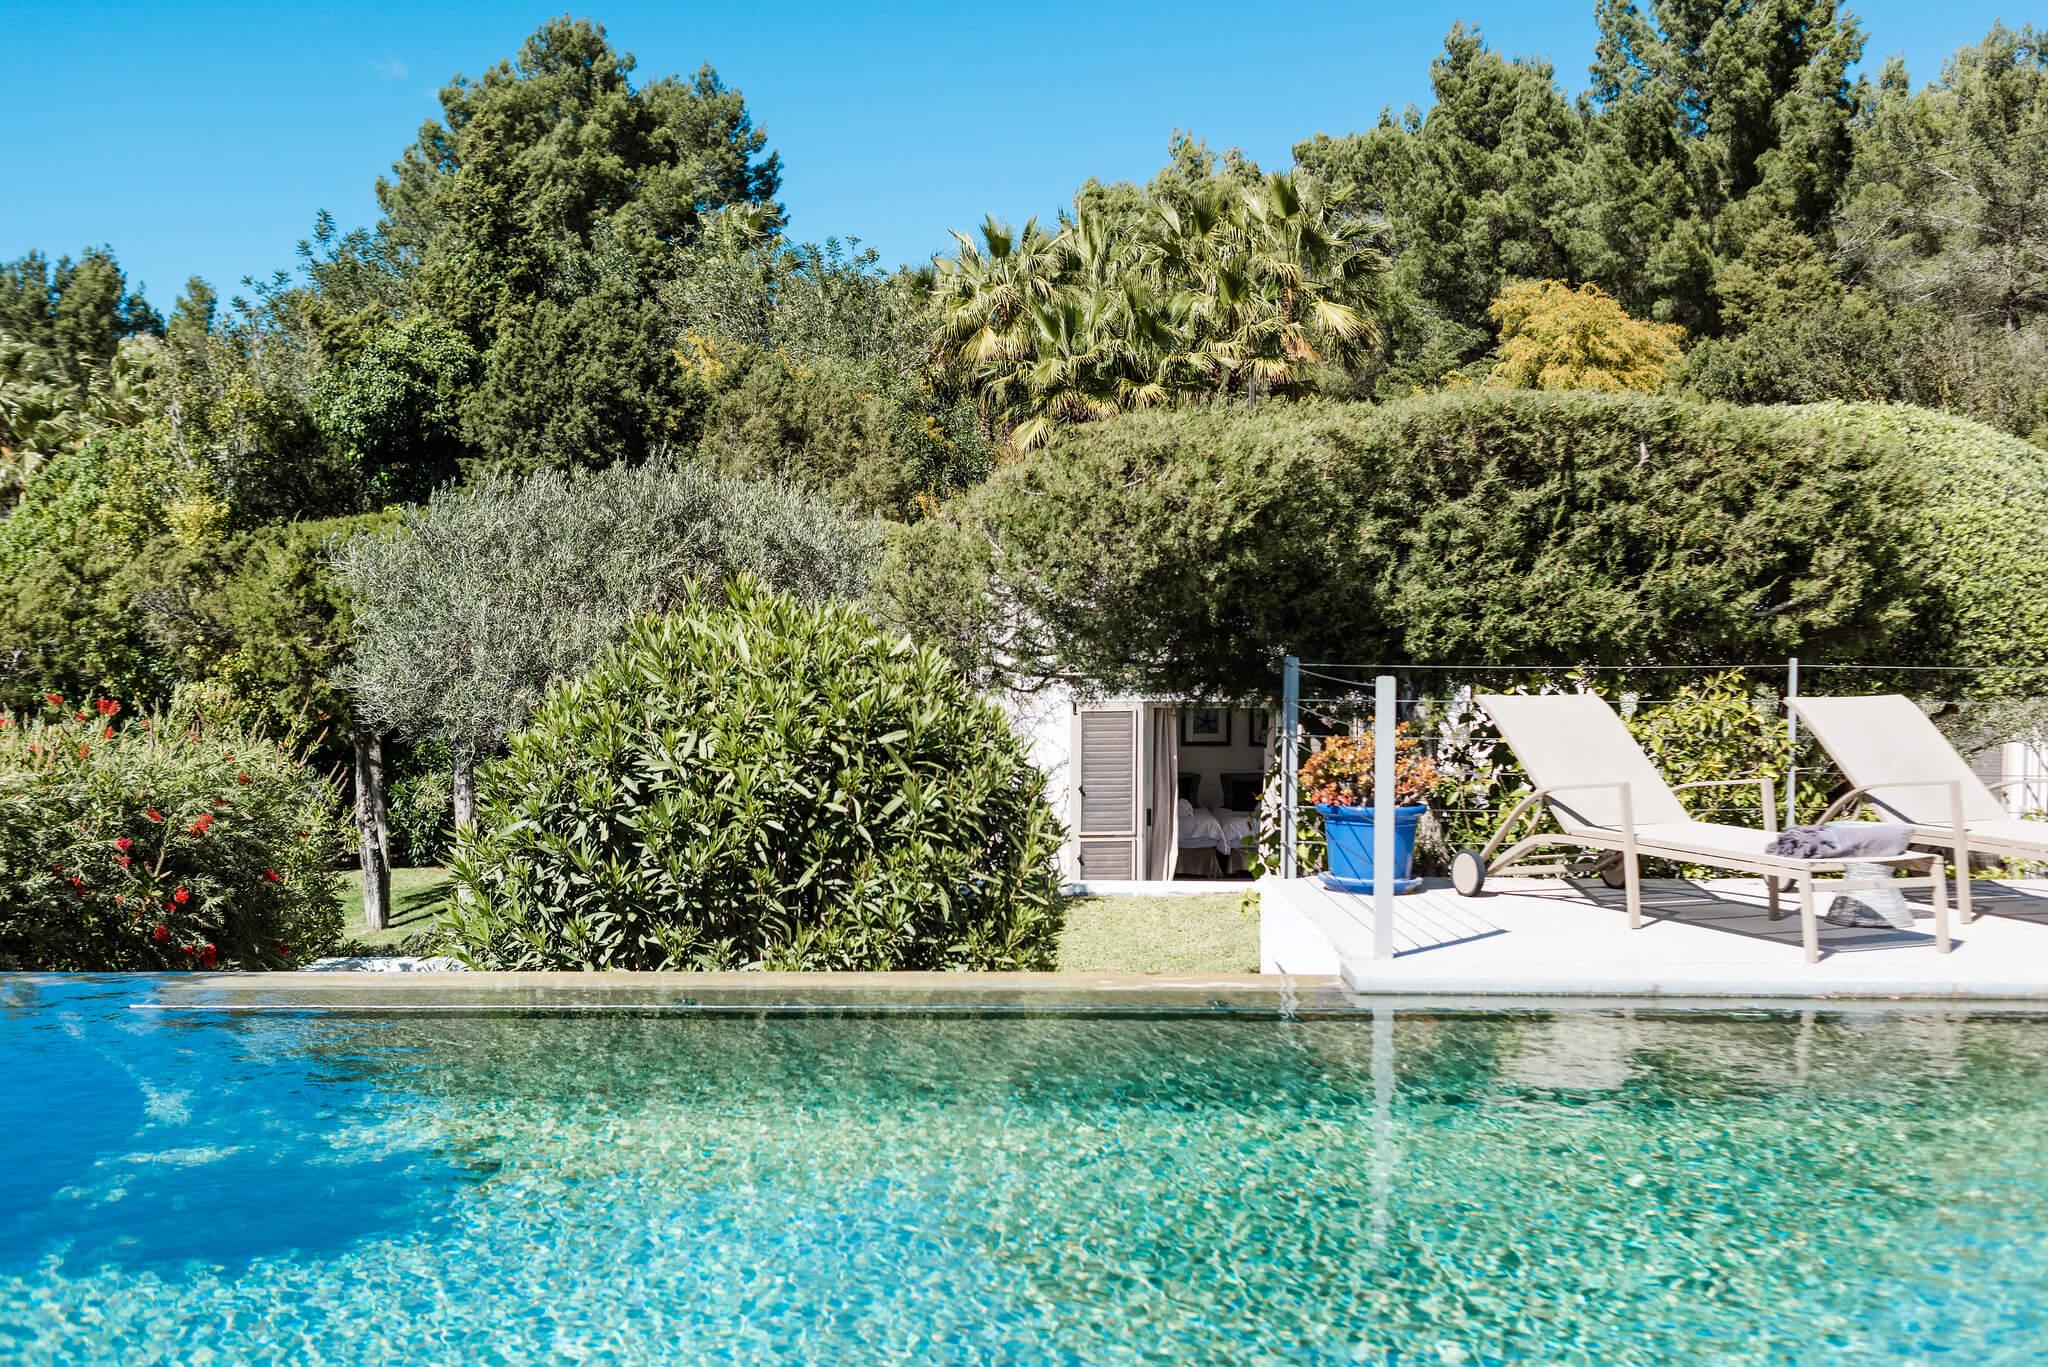 https://www.white-ibiza.com/wp-content/uploads/2020/06/white-ibiza-villas-casa-nyah-exterior-pool-water.jpg